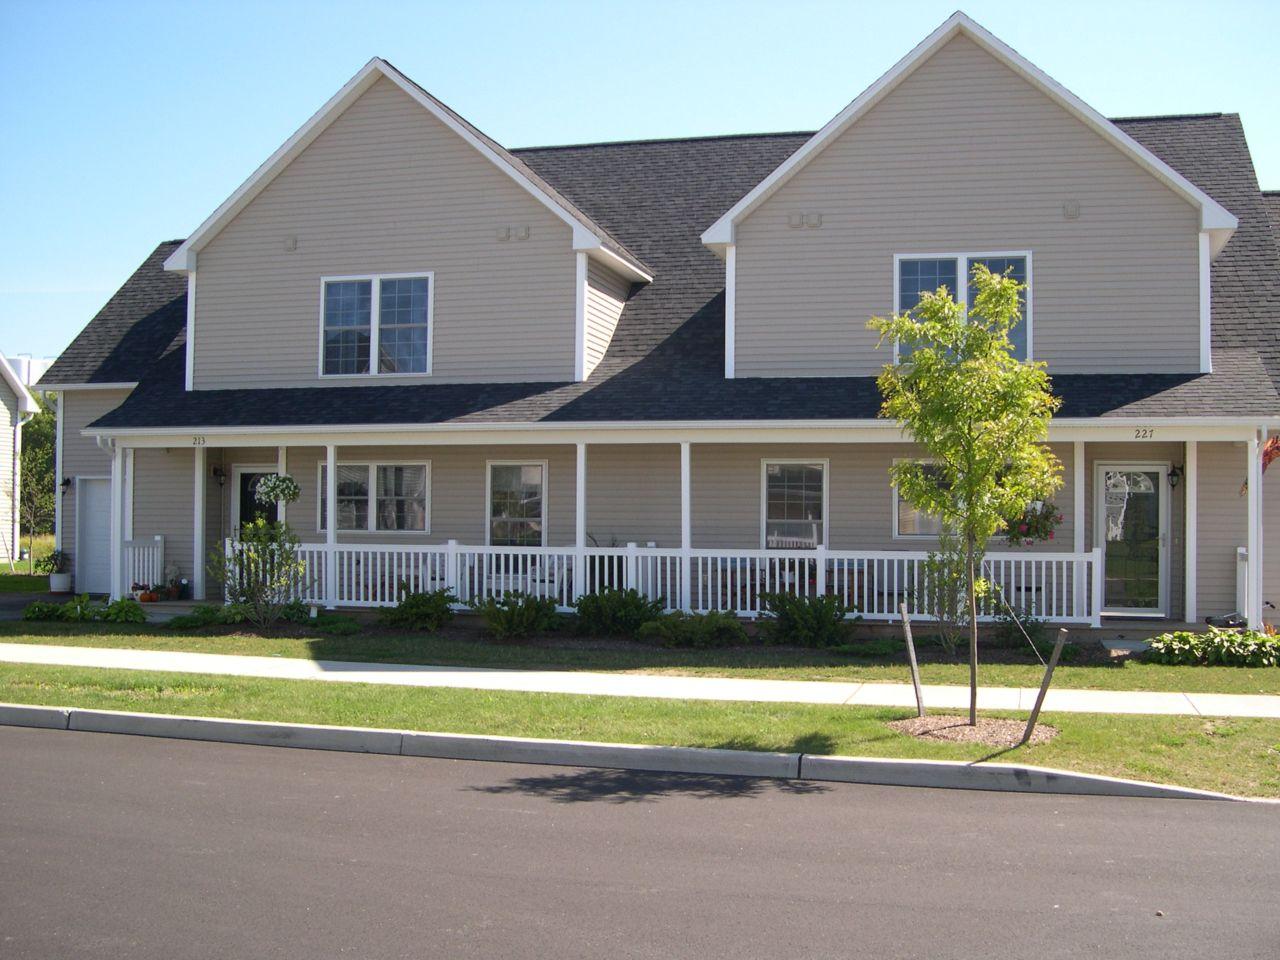 How to Convert a SingleFamily Home into a Duplex